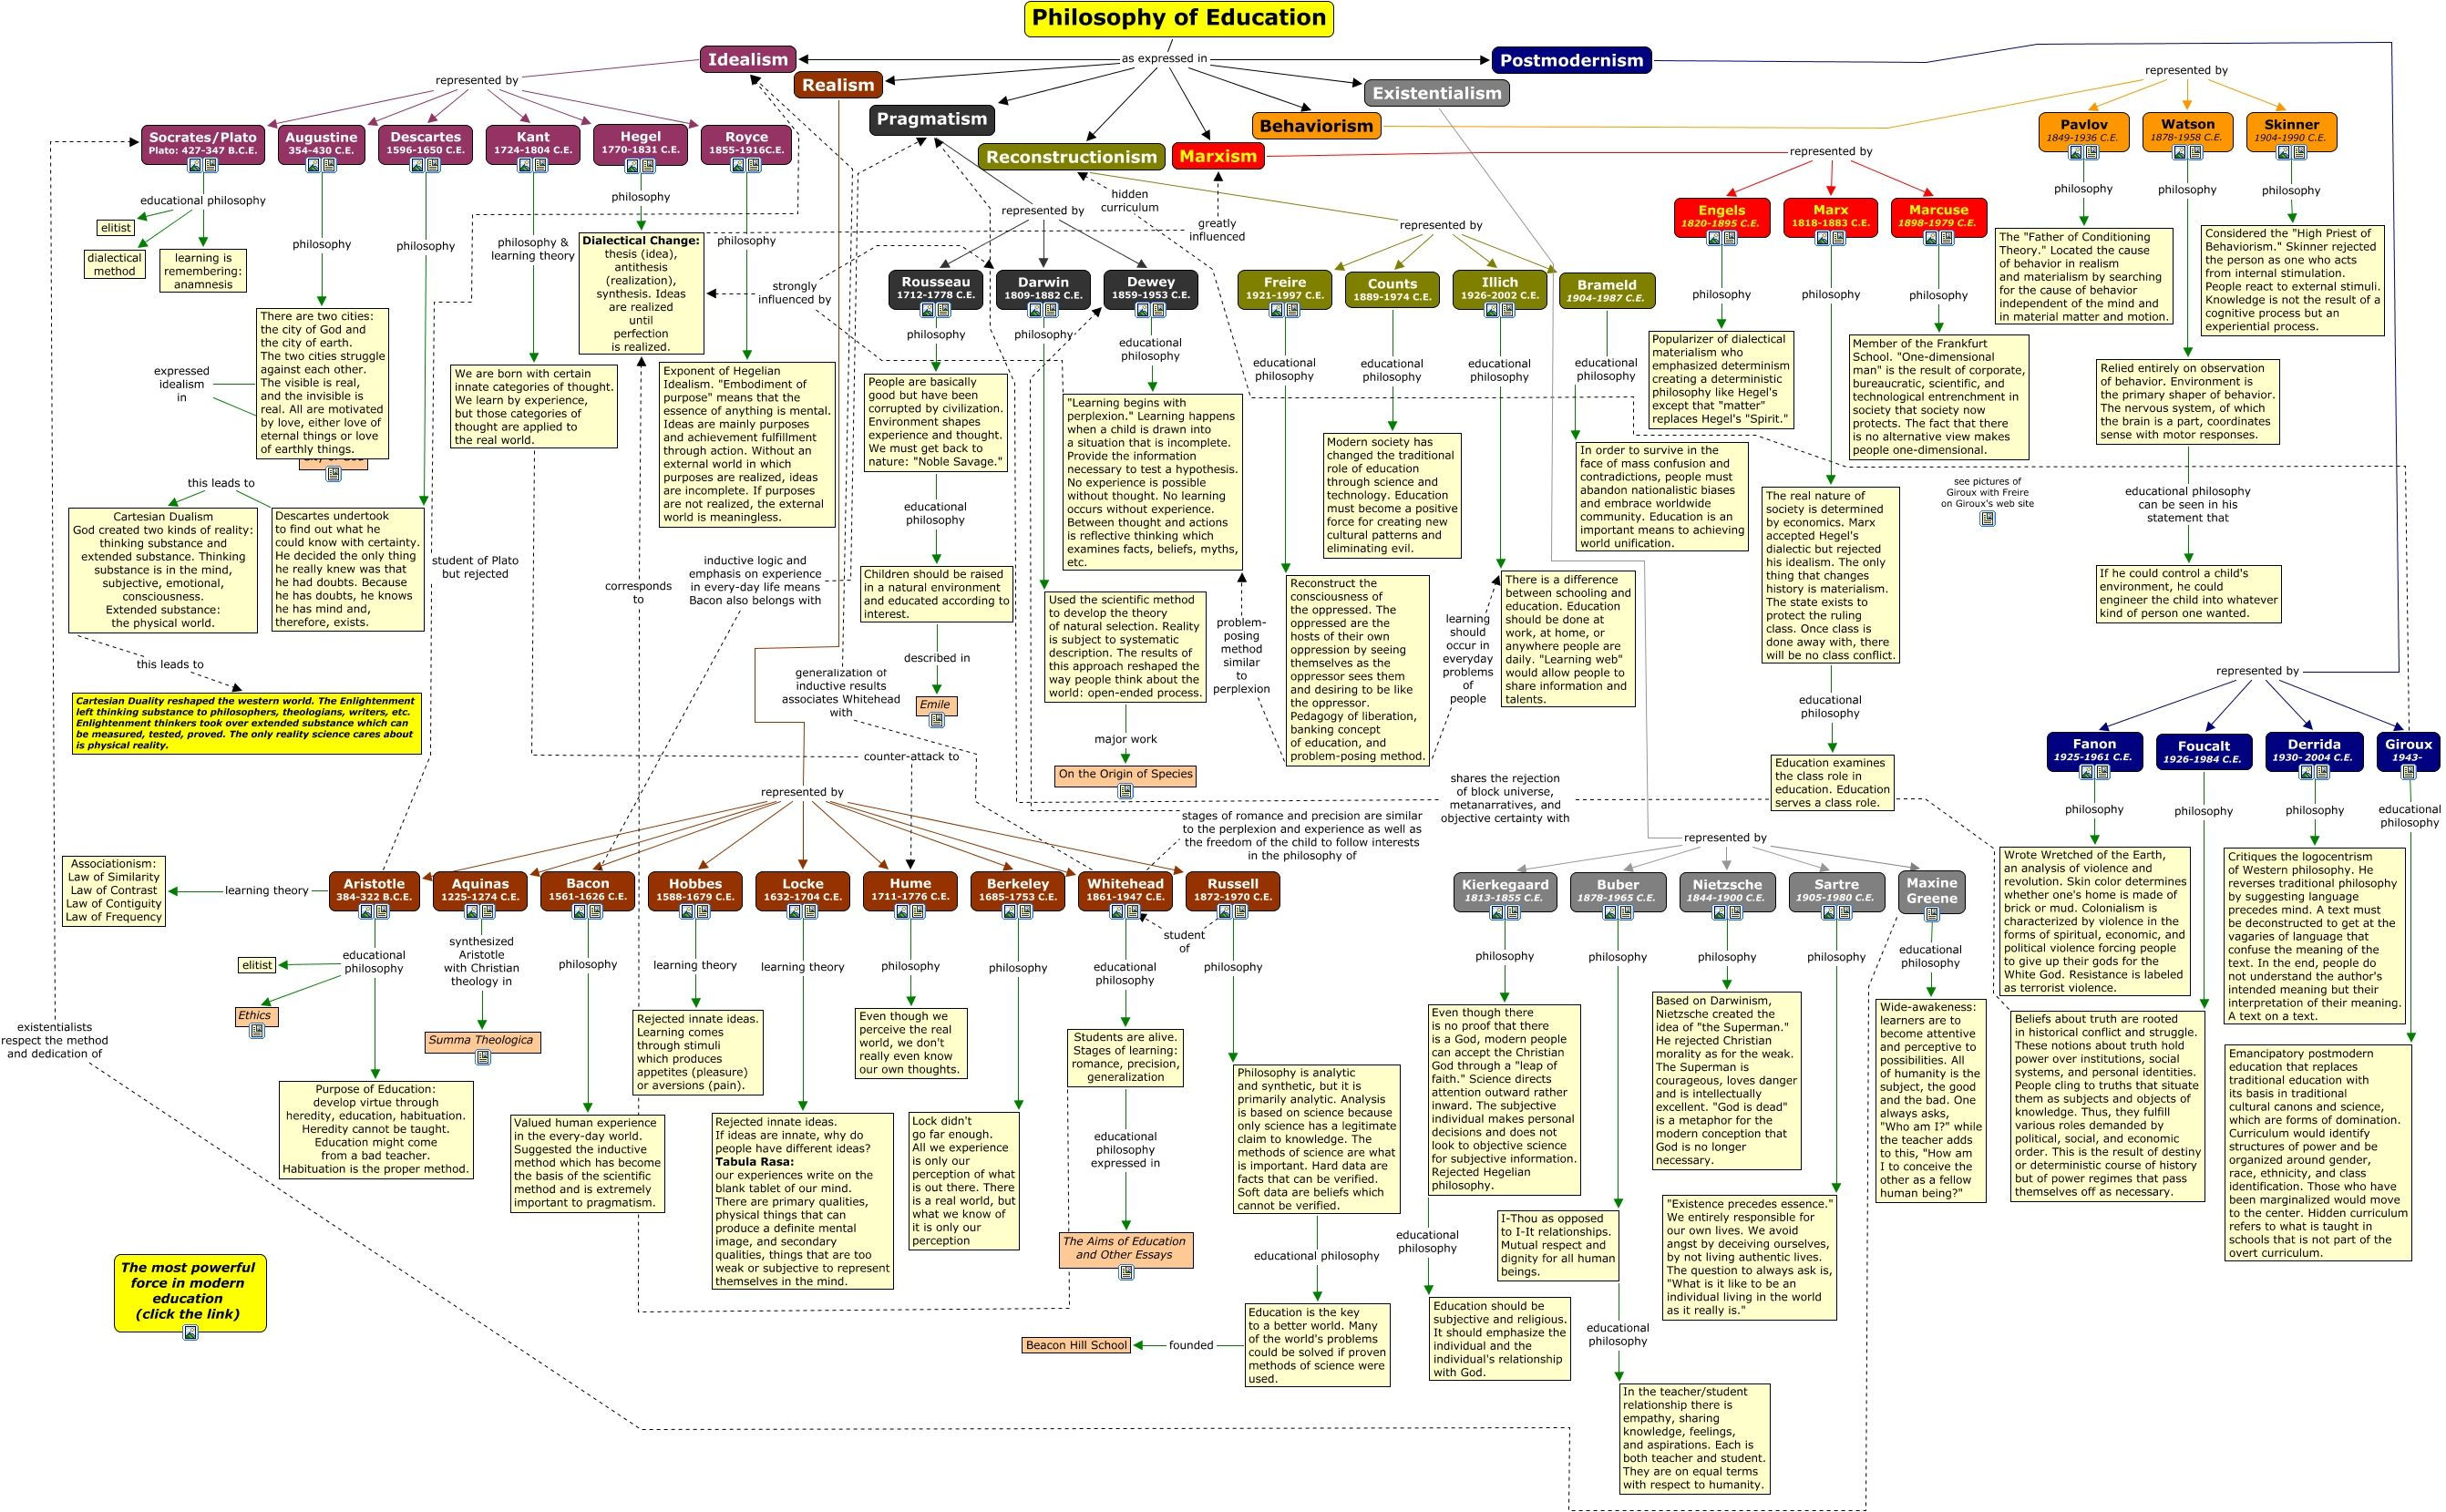 idealism philosophy of education pdf